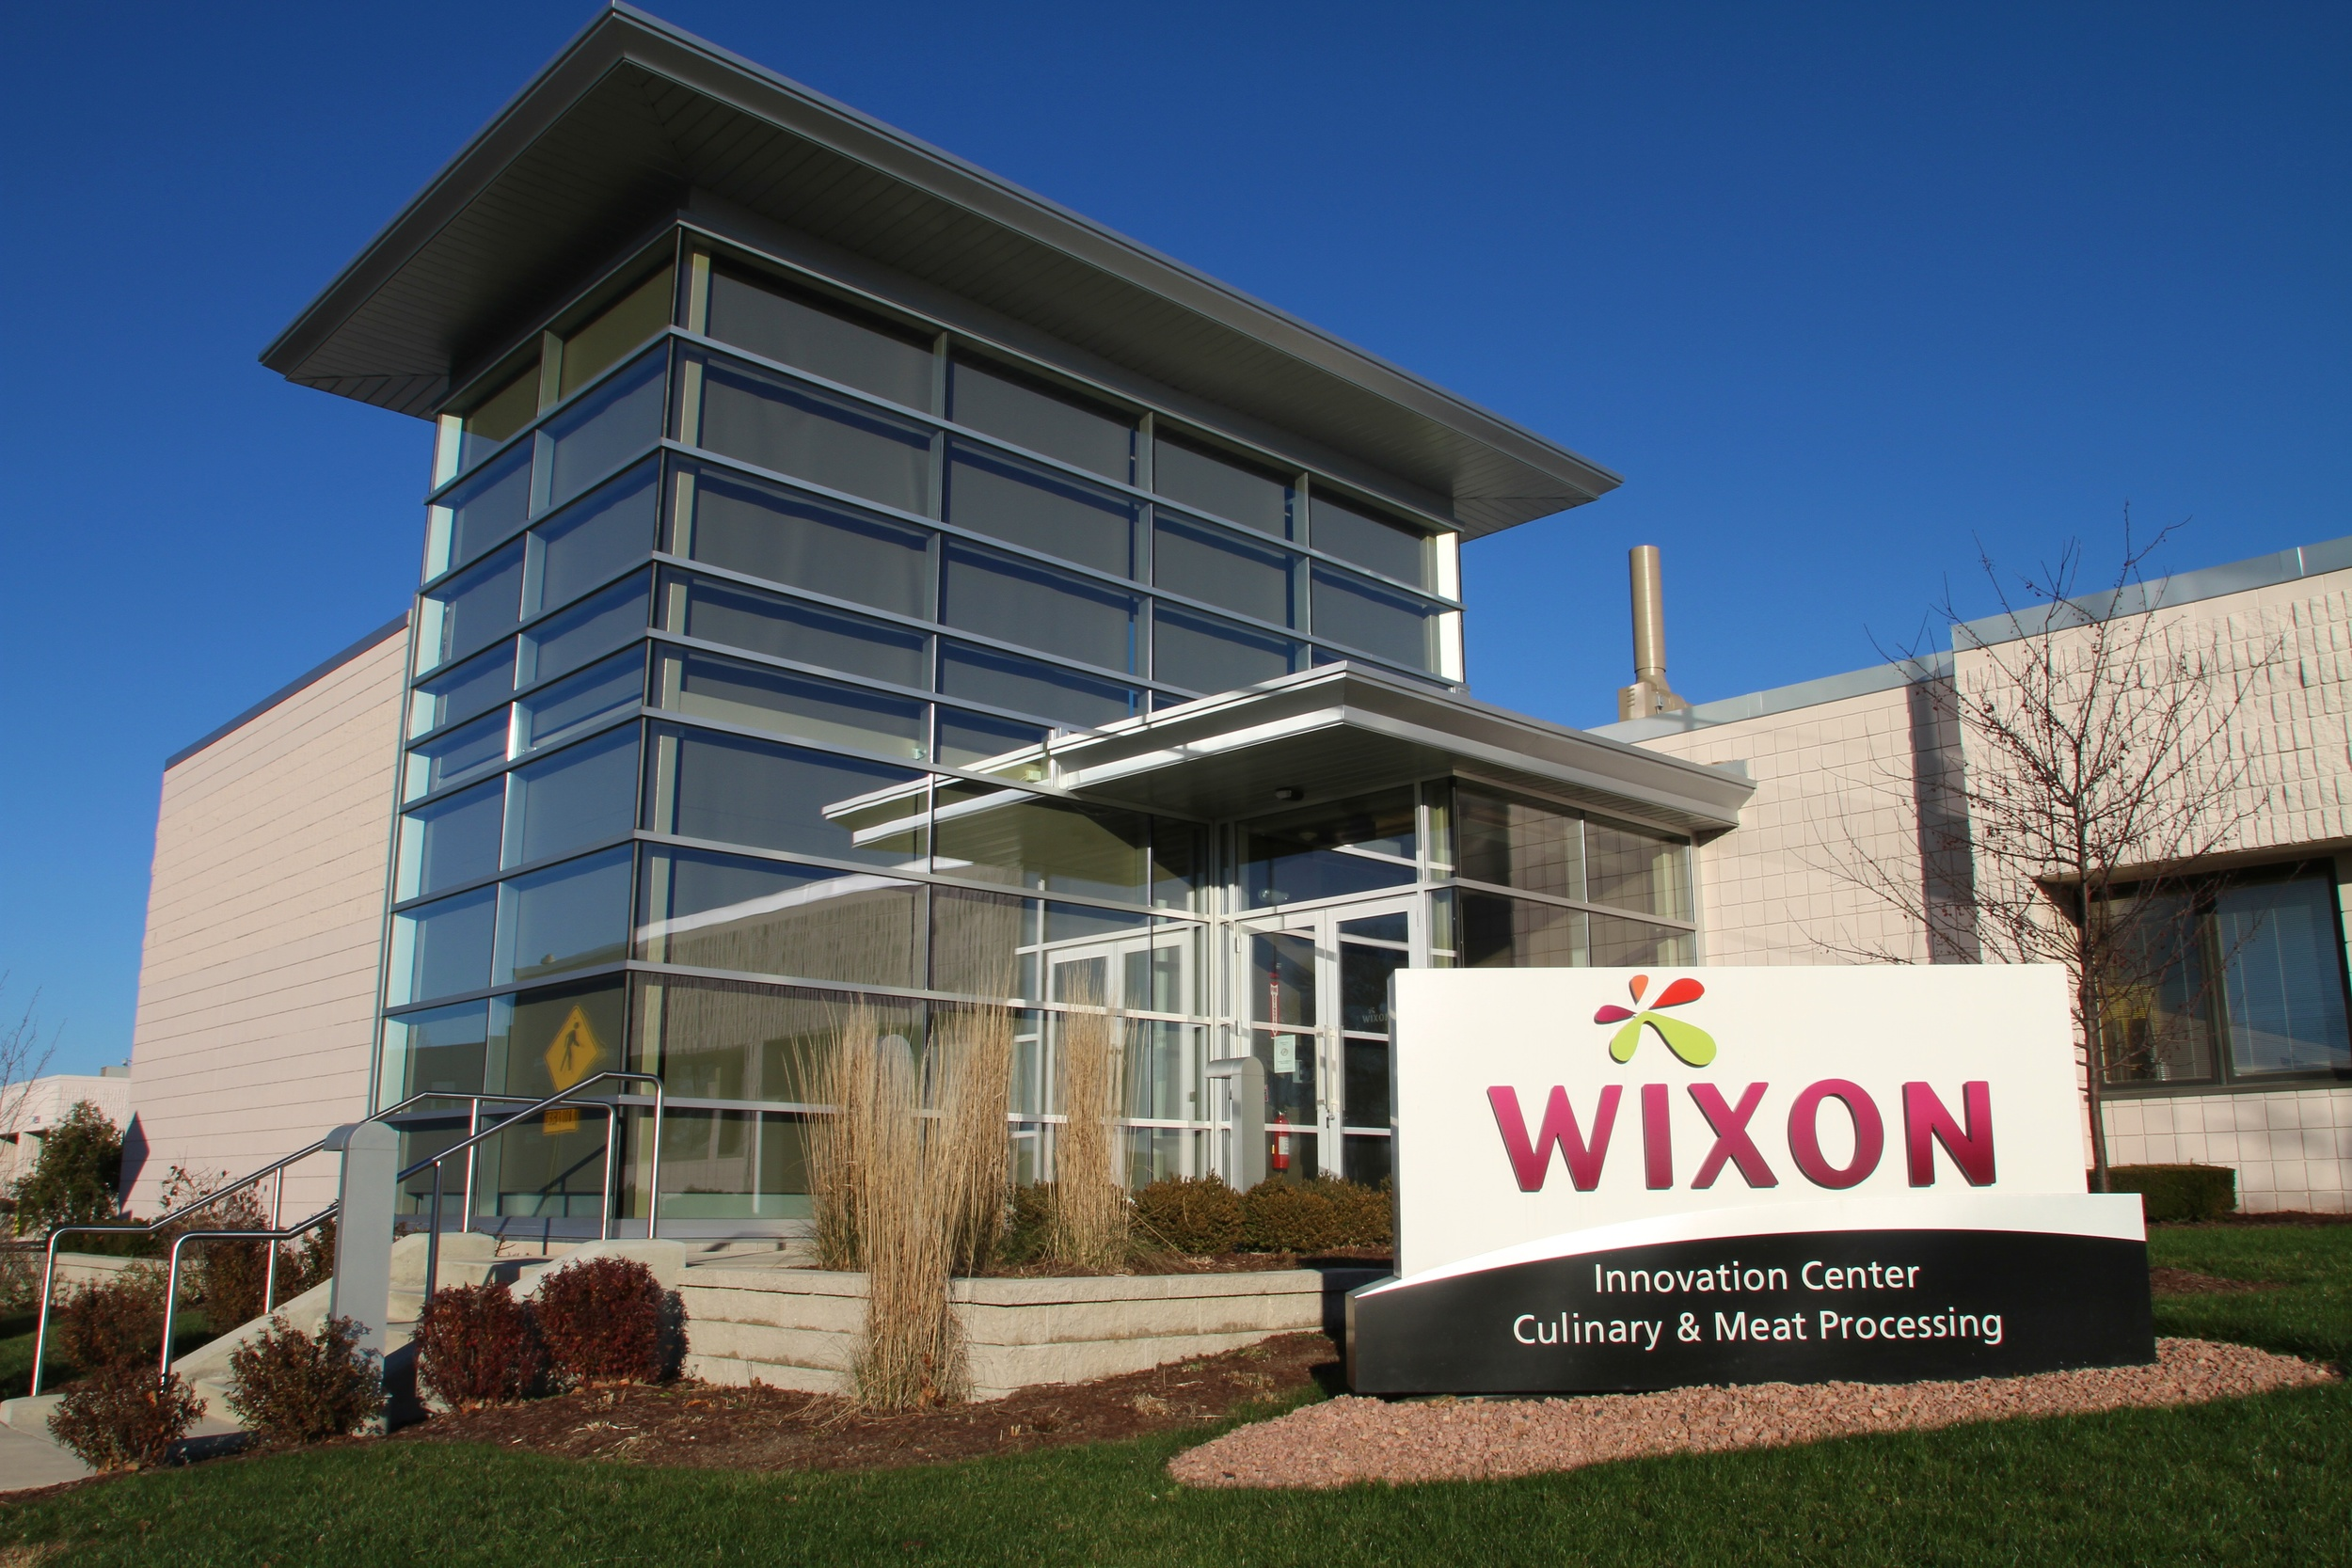 Wixon Innovation Center (3).jpg